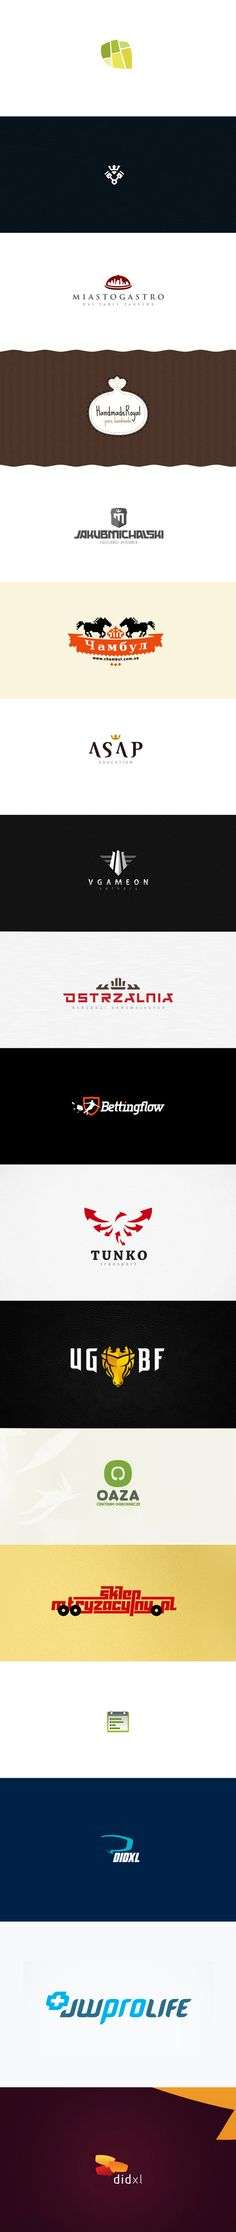 my logos '11 by Karol Sidorowski, via Behance